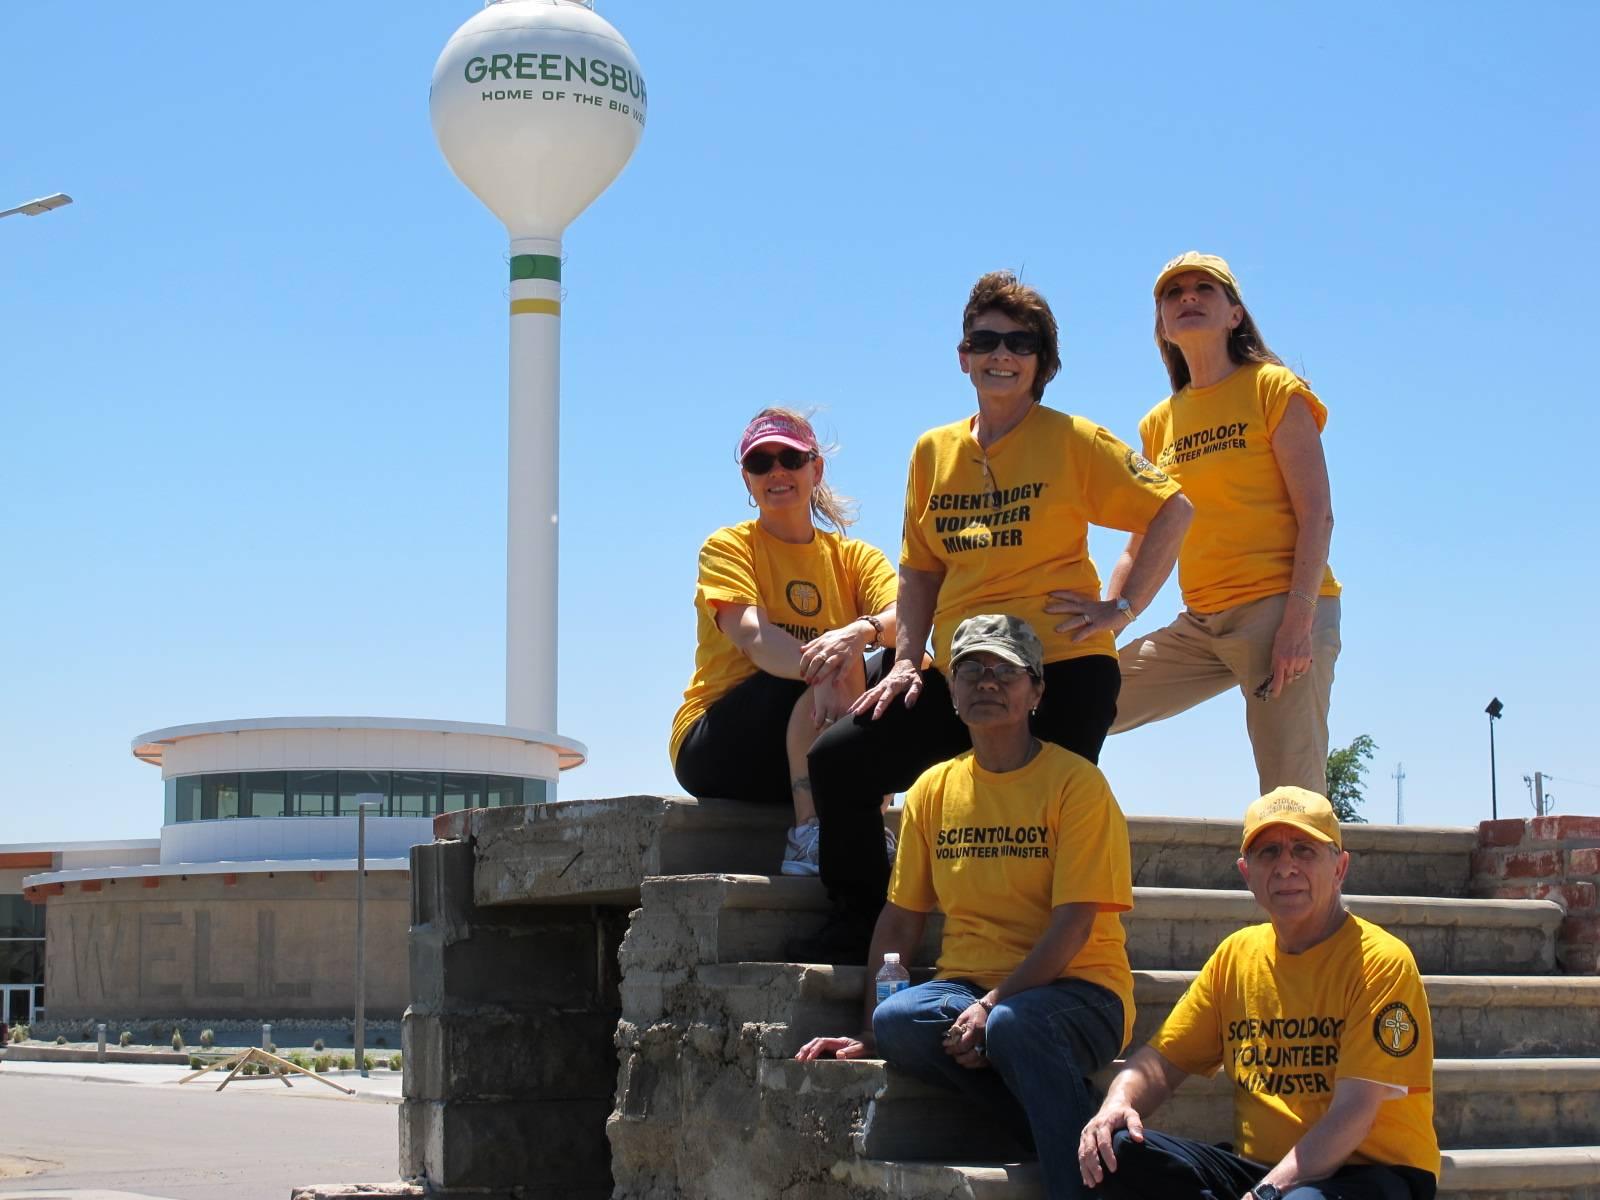 Volunteer Ministers Return to Greensburg